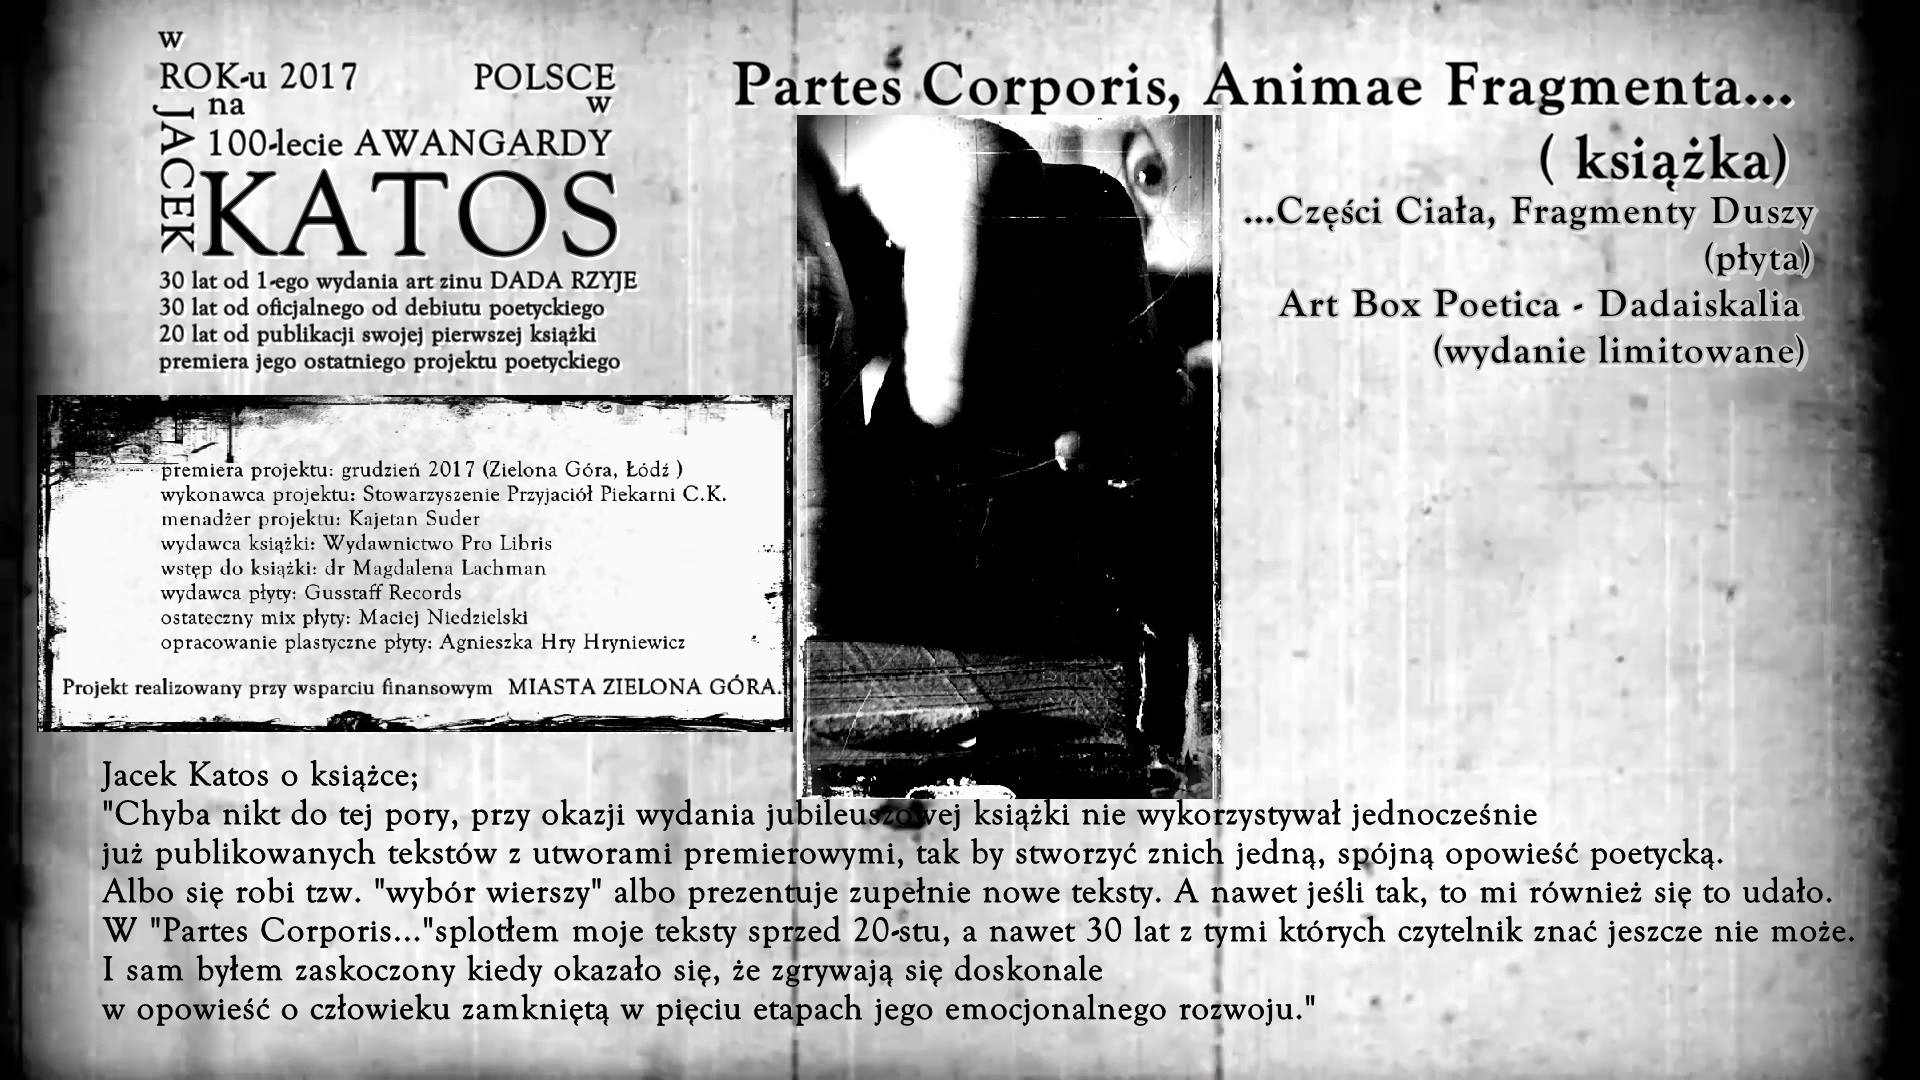 Partes Corporis, Animae Fragmenta...